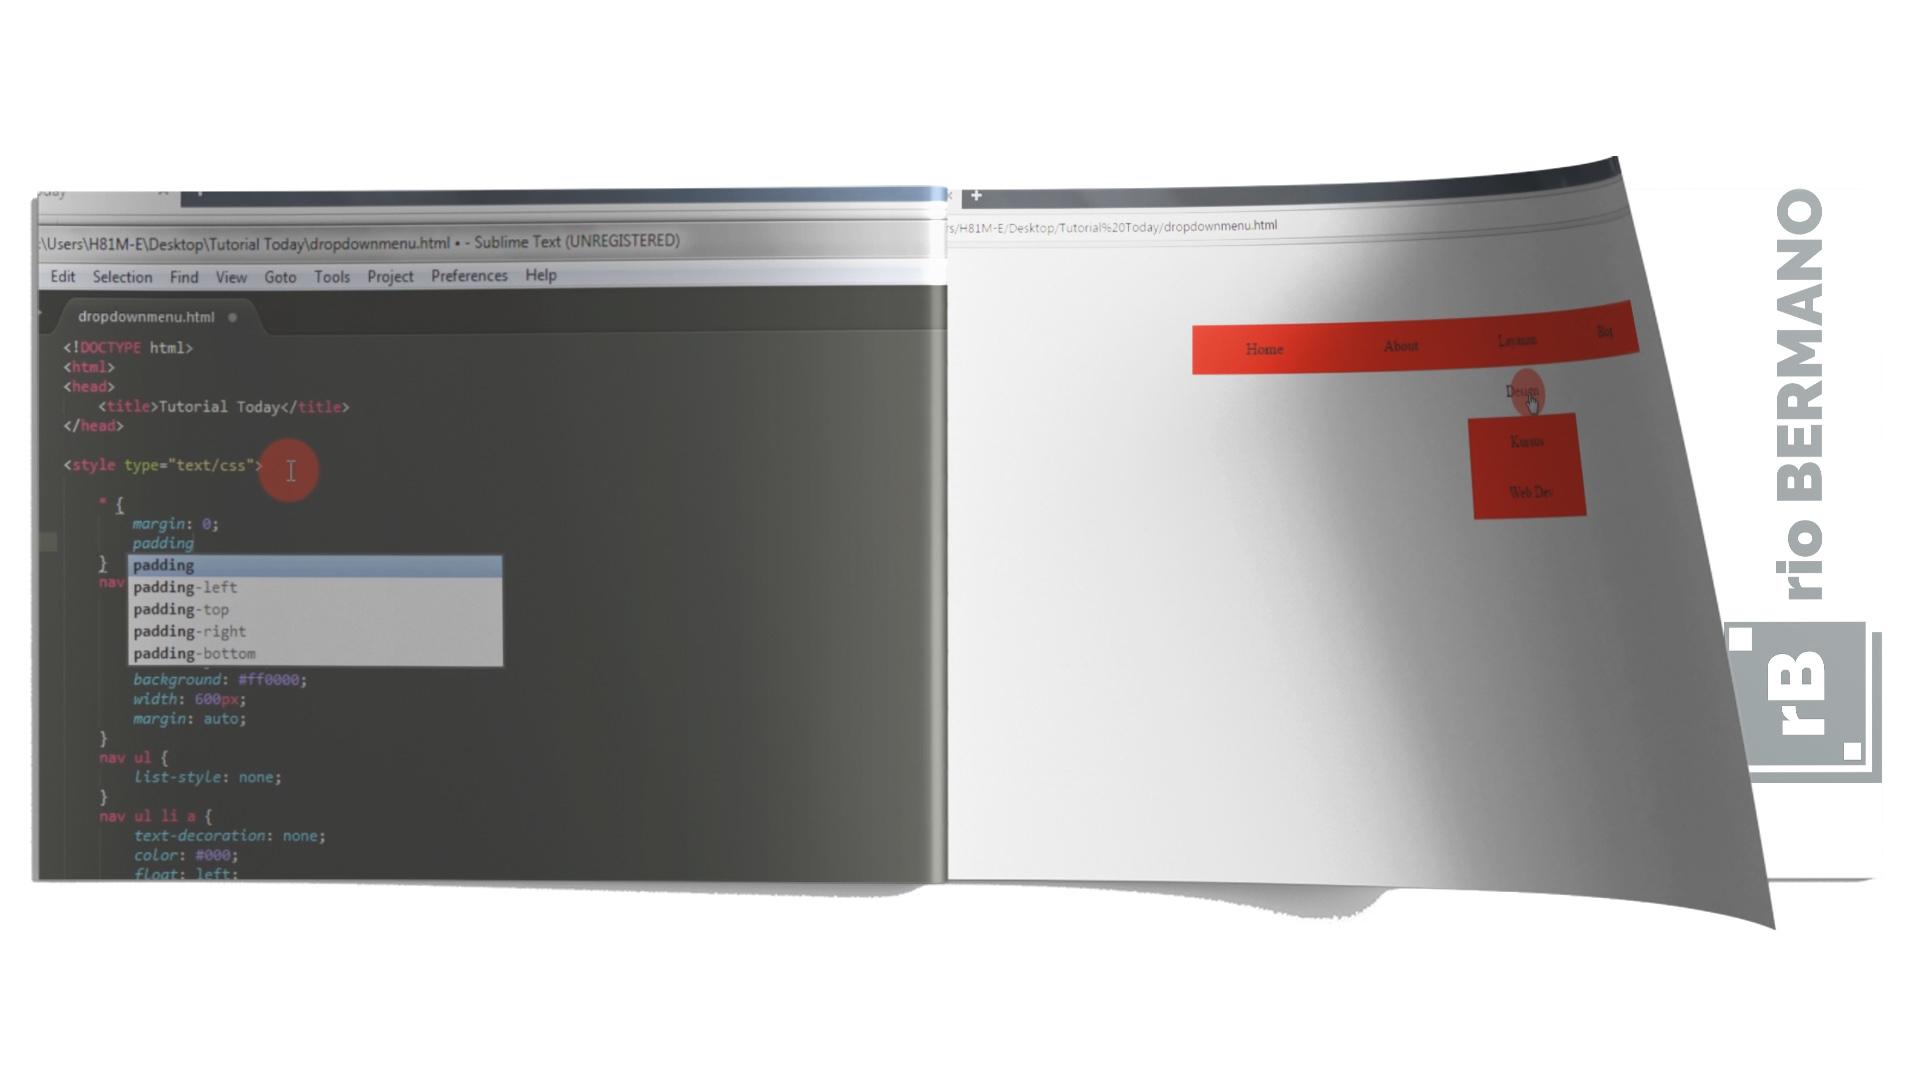 cara bikin dropdown menu html - rio bermano